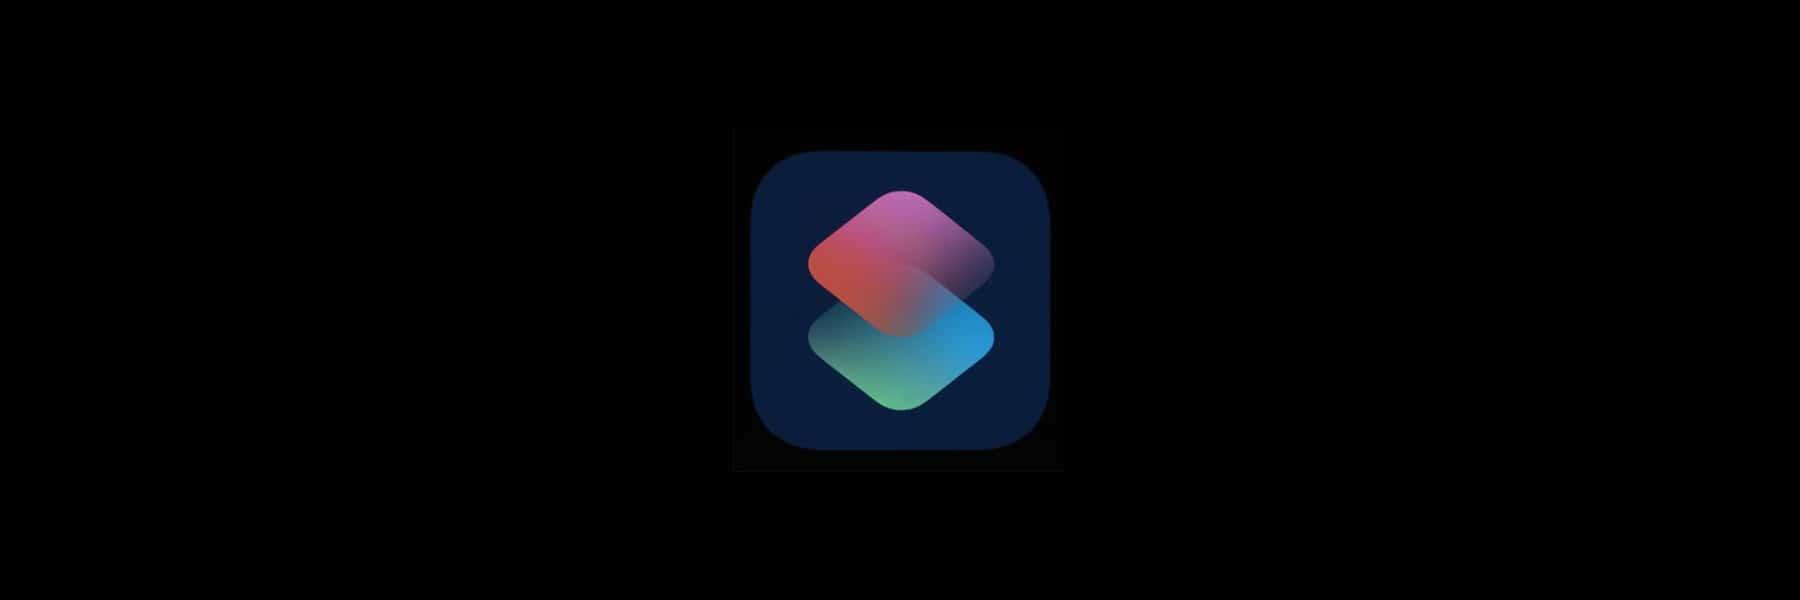 Siri Shortcuts: Automationen über HomeKit hinaus realisieren